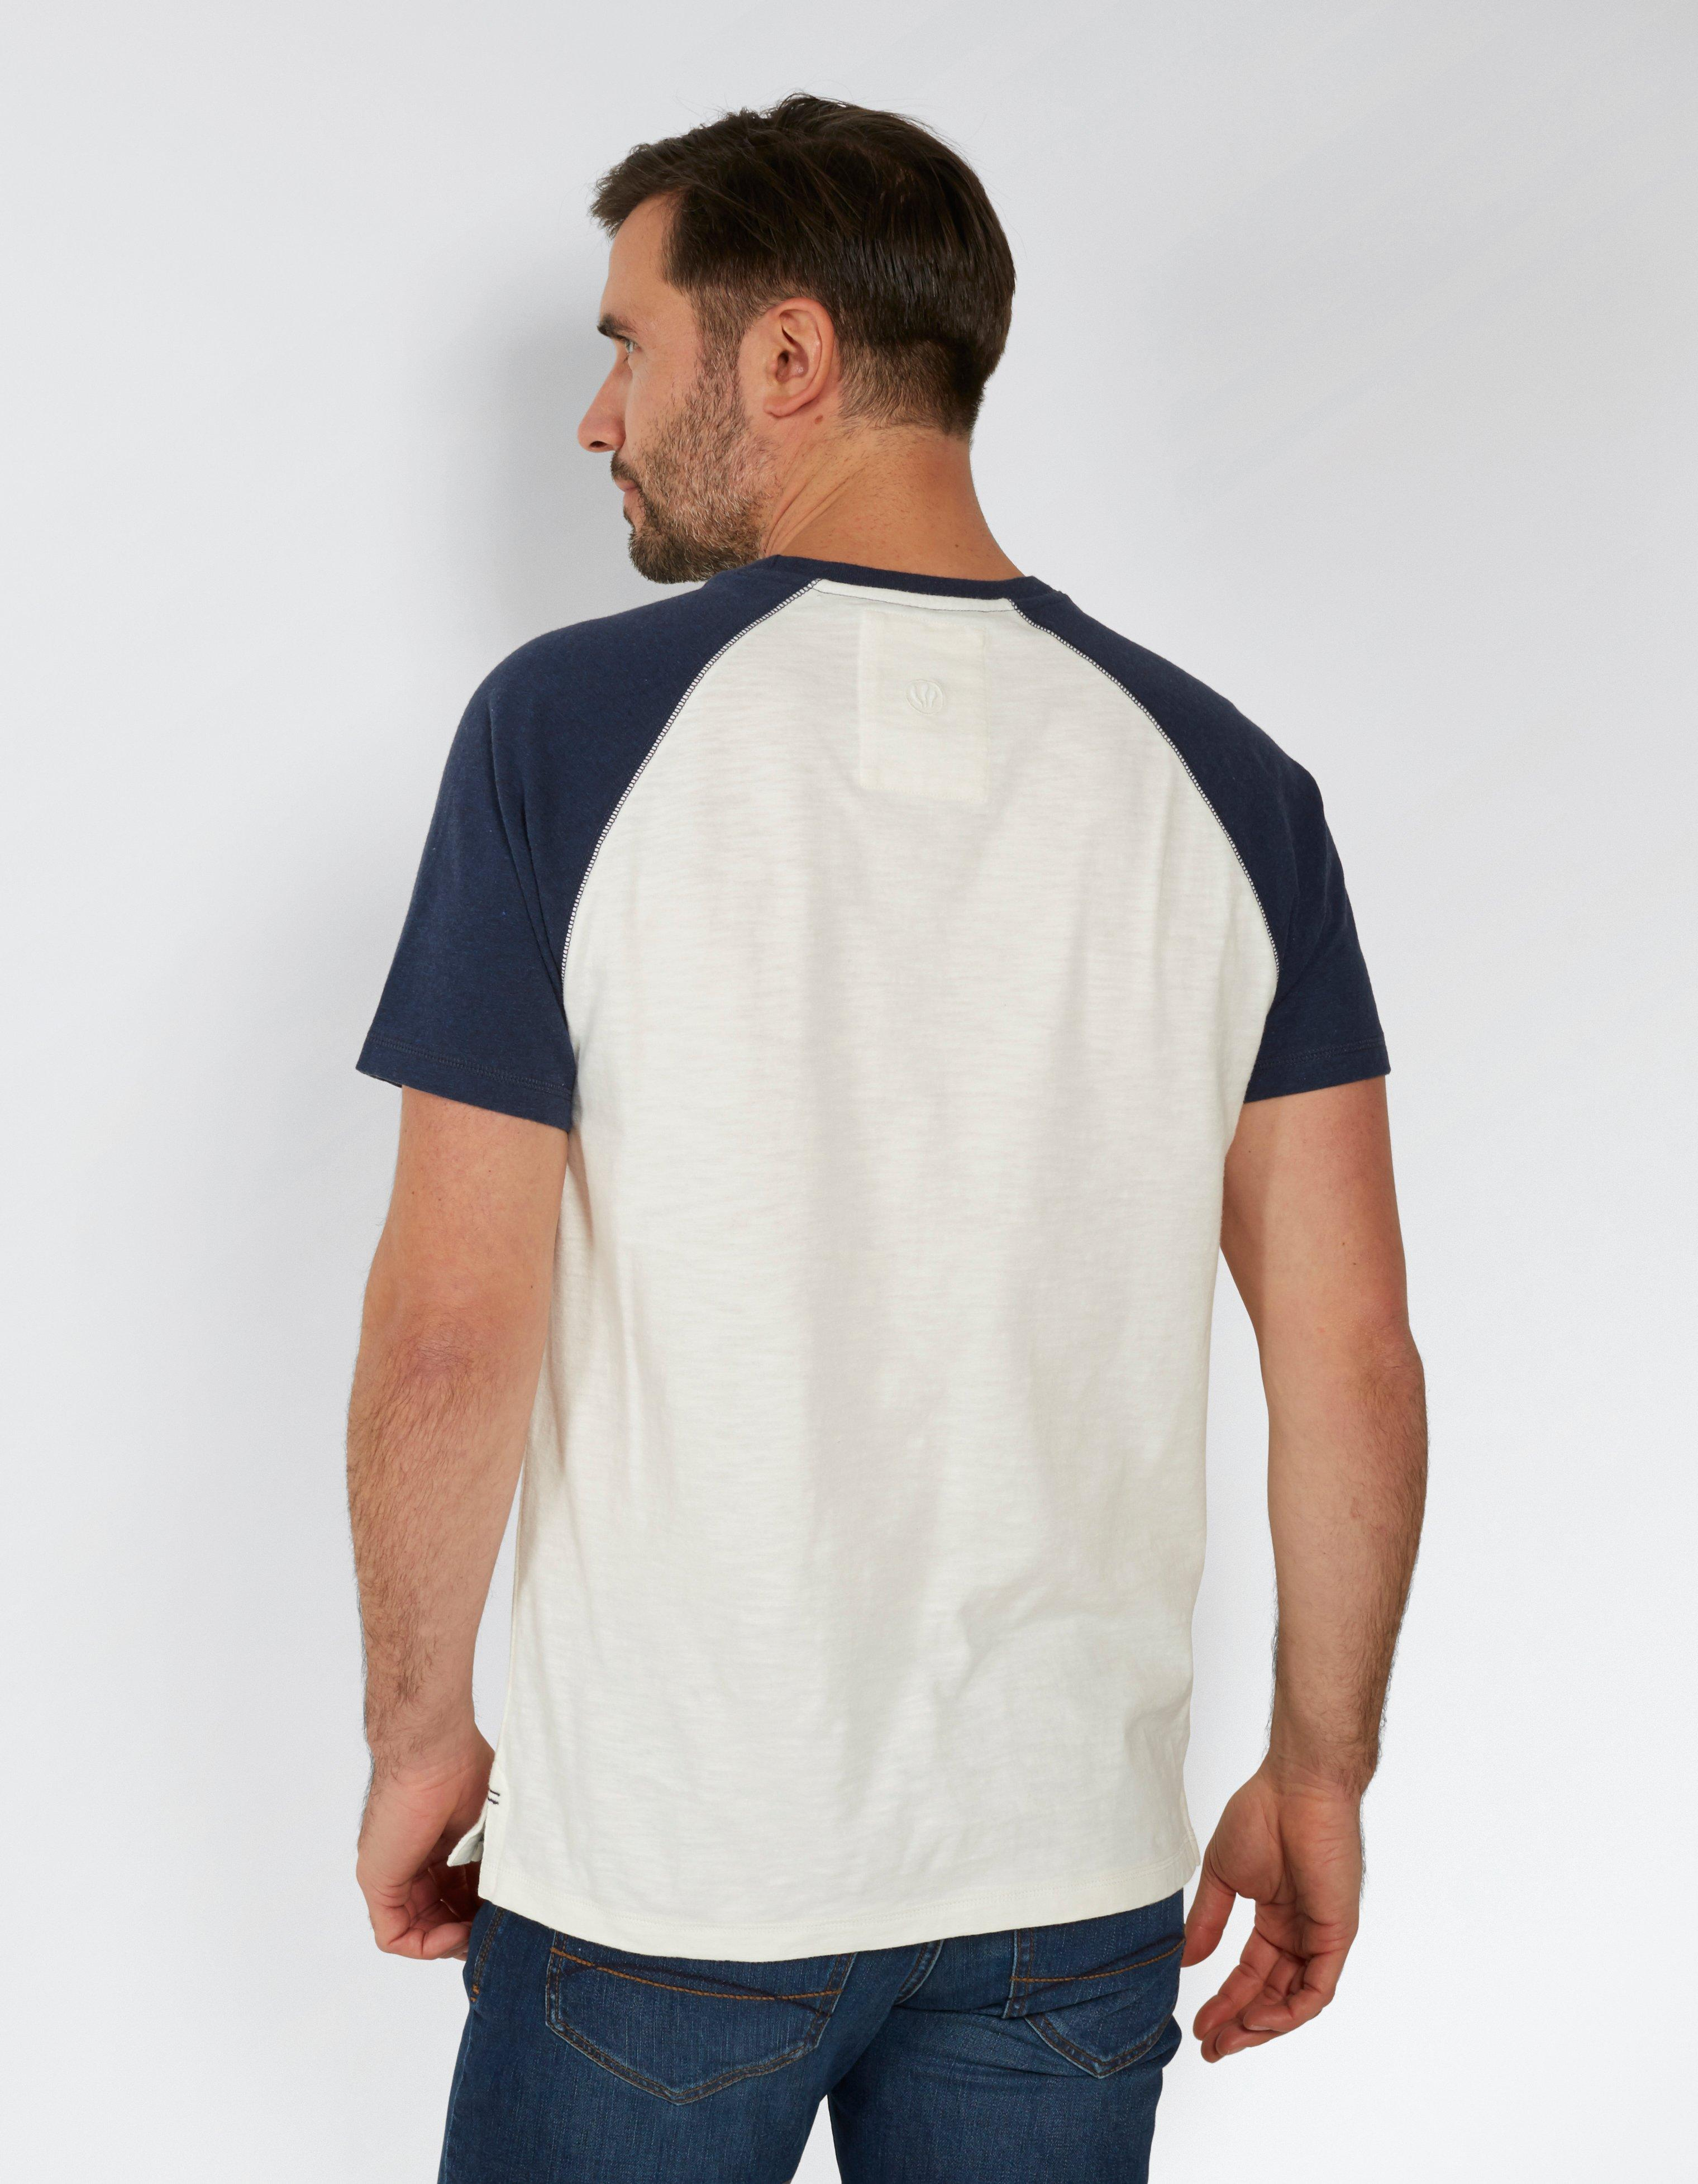 Tilford Organic Cotton Raglan T Shirt